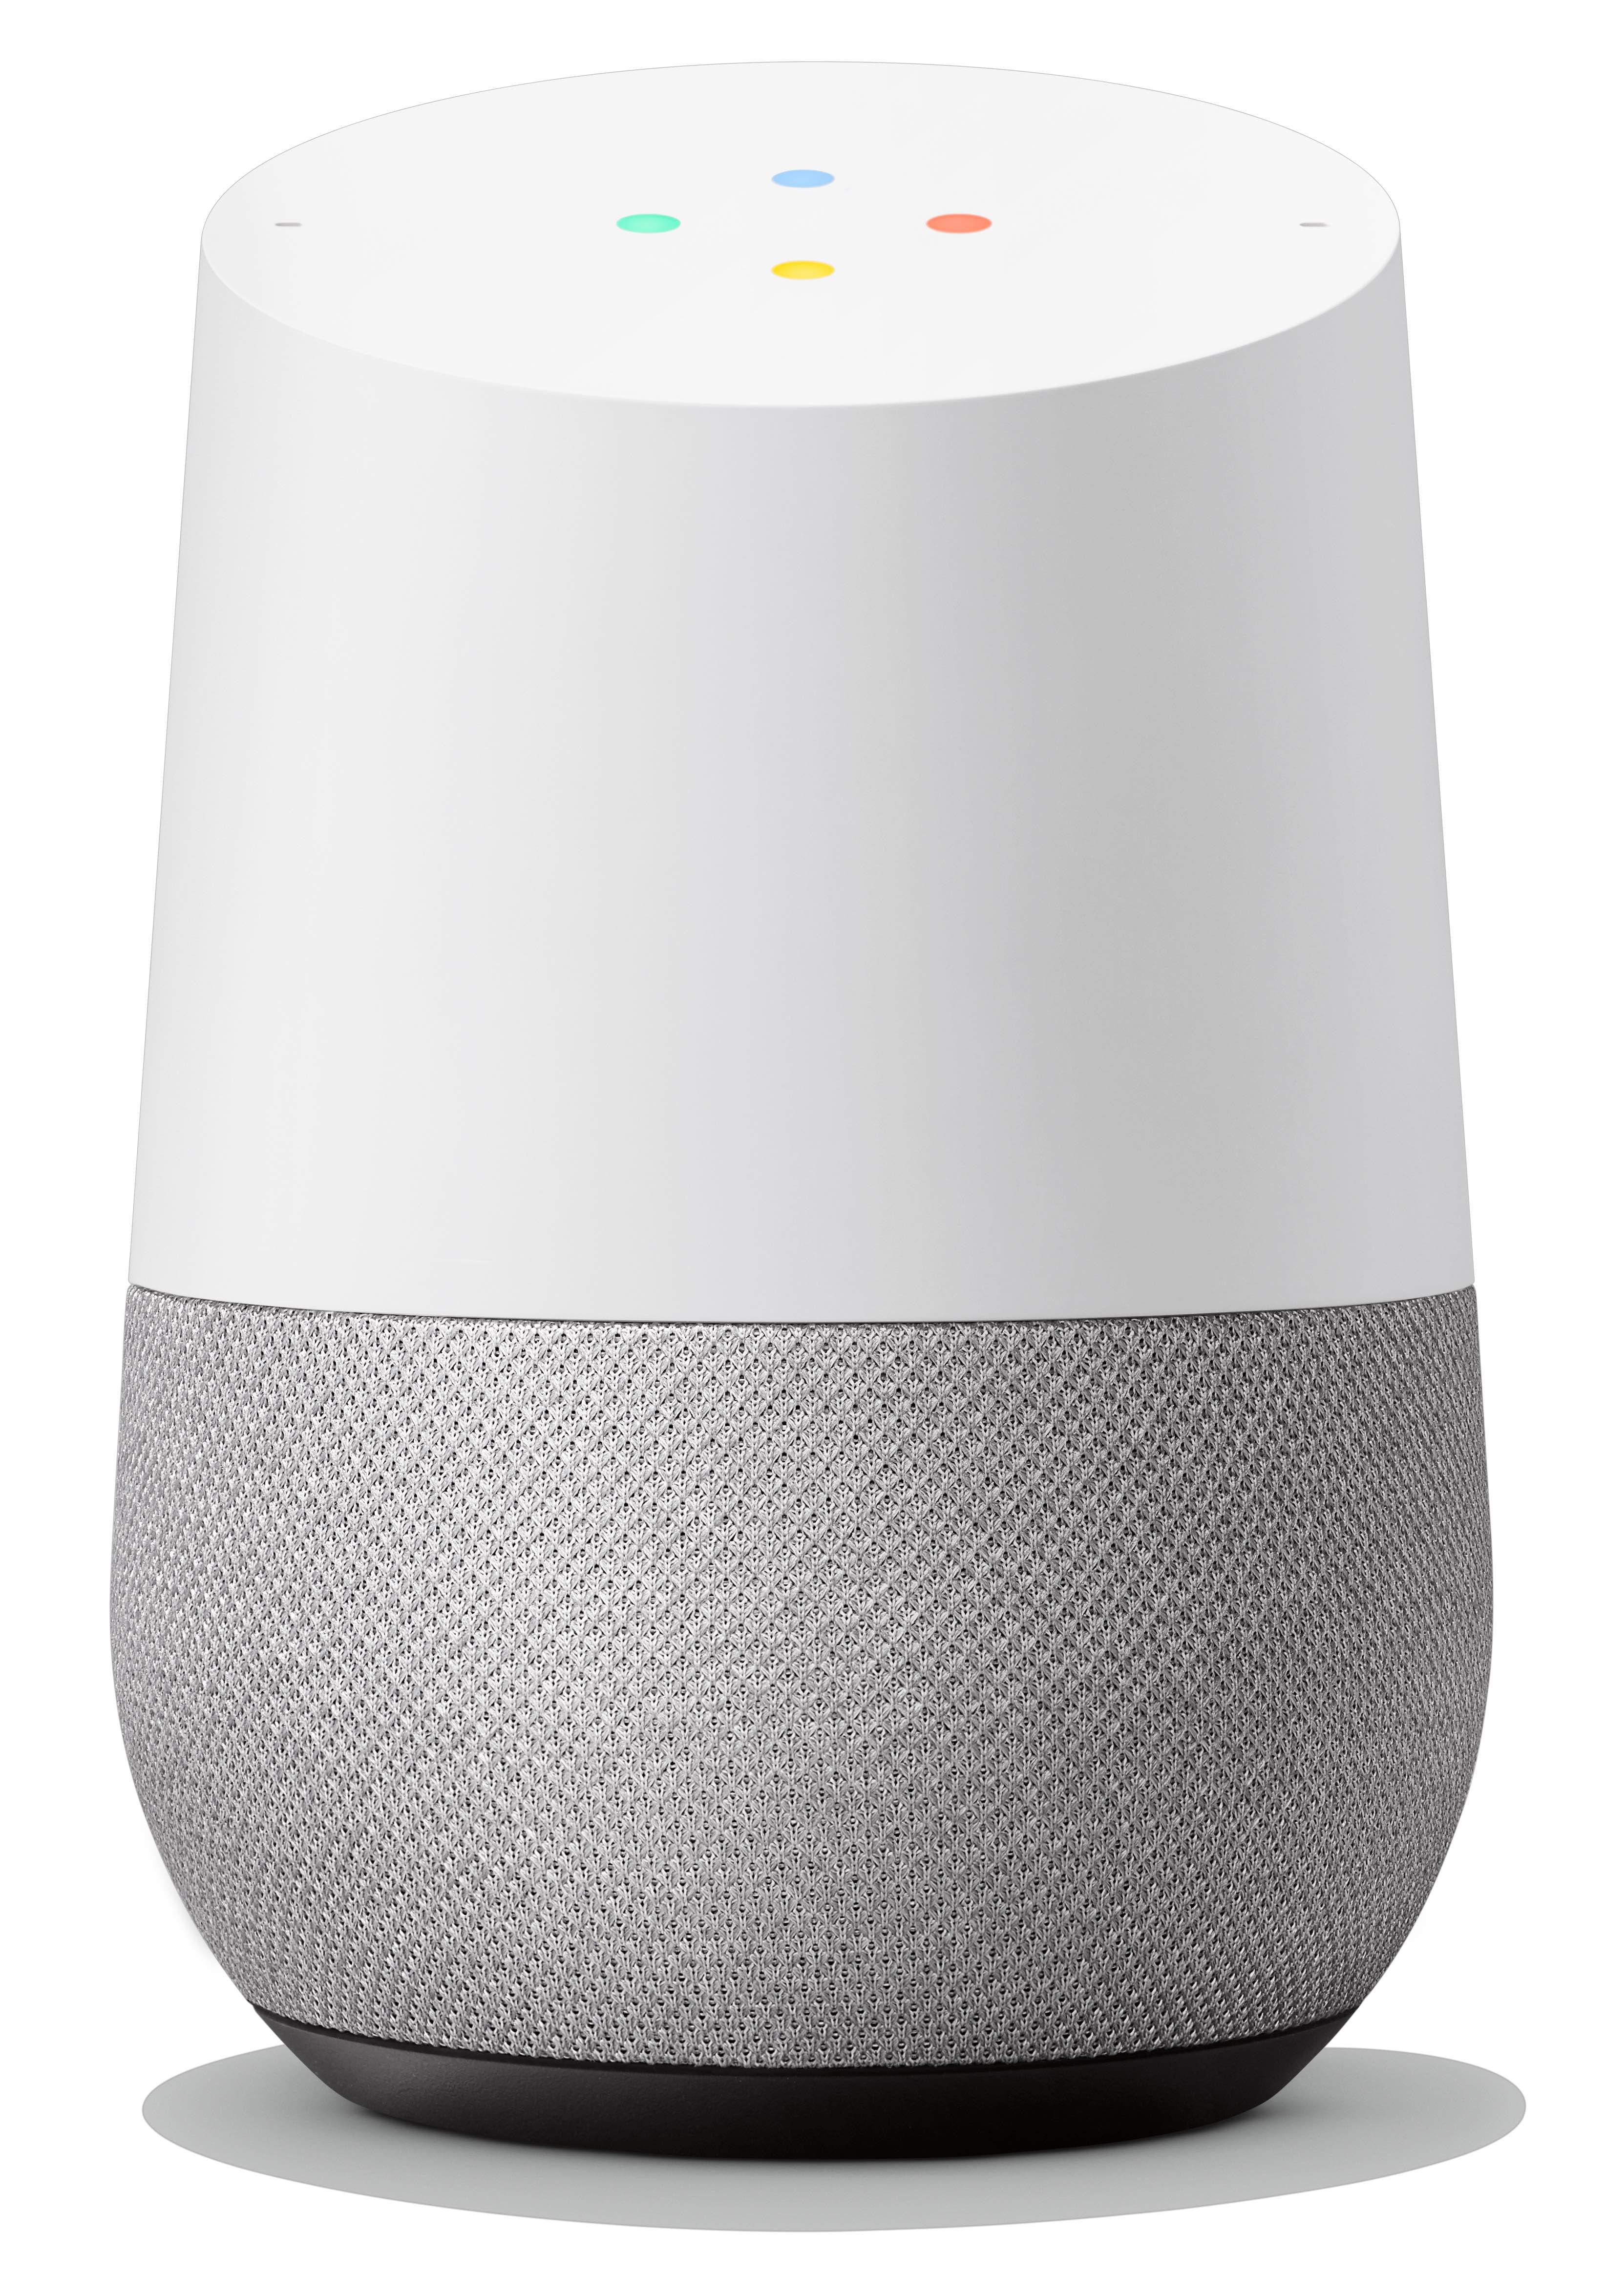 Google Home - Smart Speaker & Google Assistant - Walmart.com